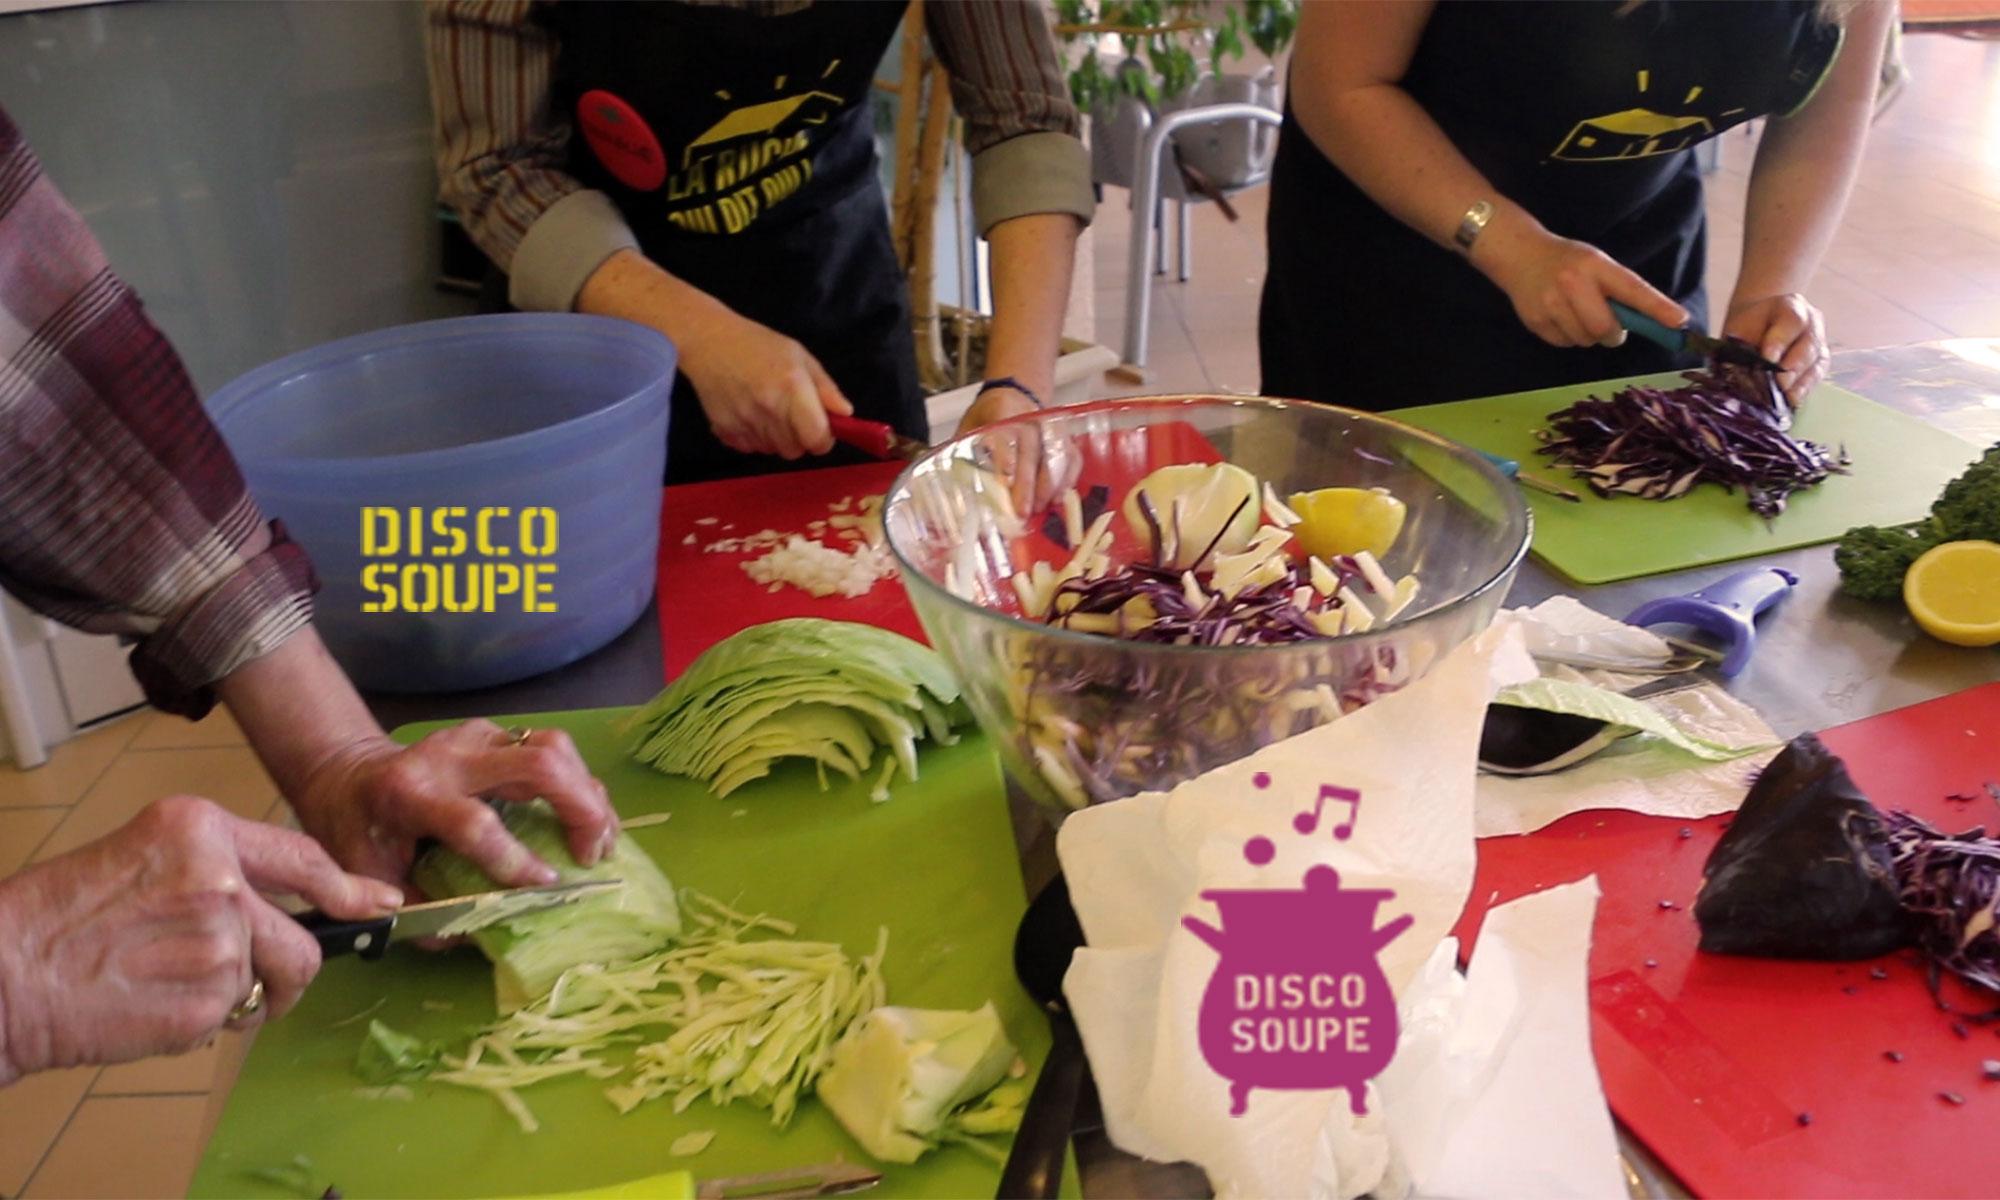 Disco Salade – La Ruche qui dit Oui!